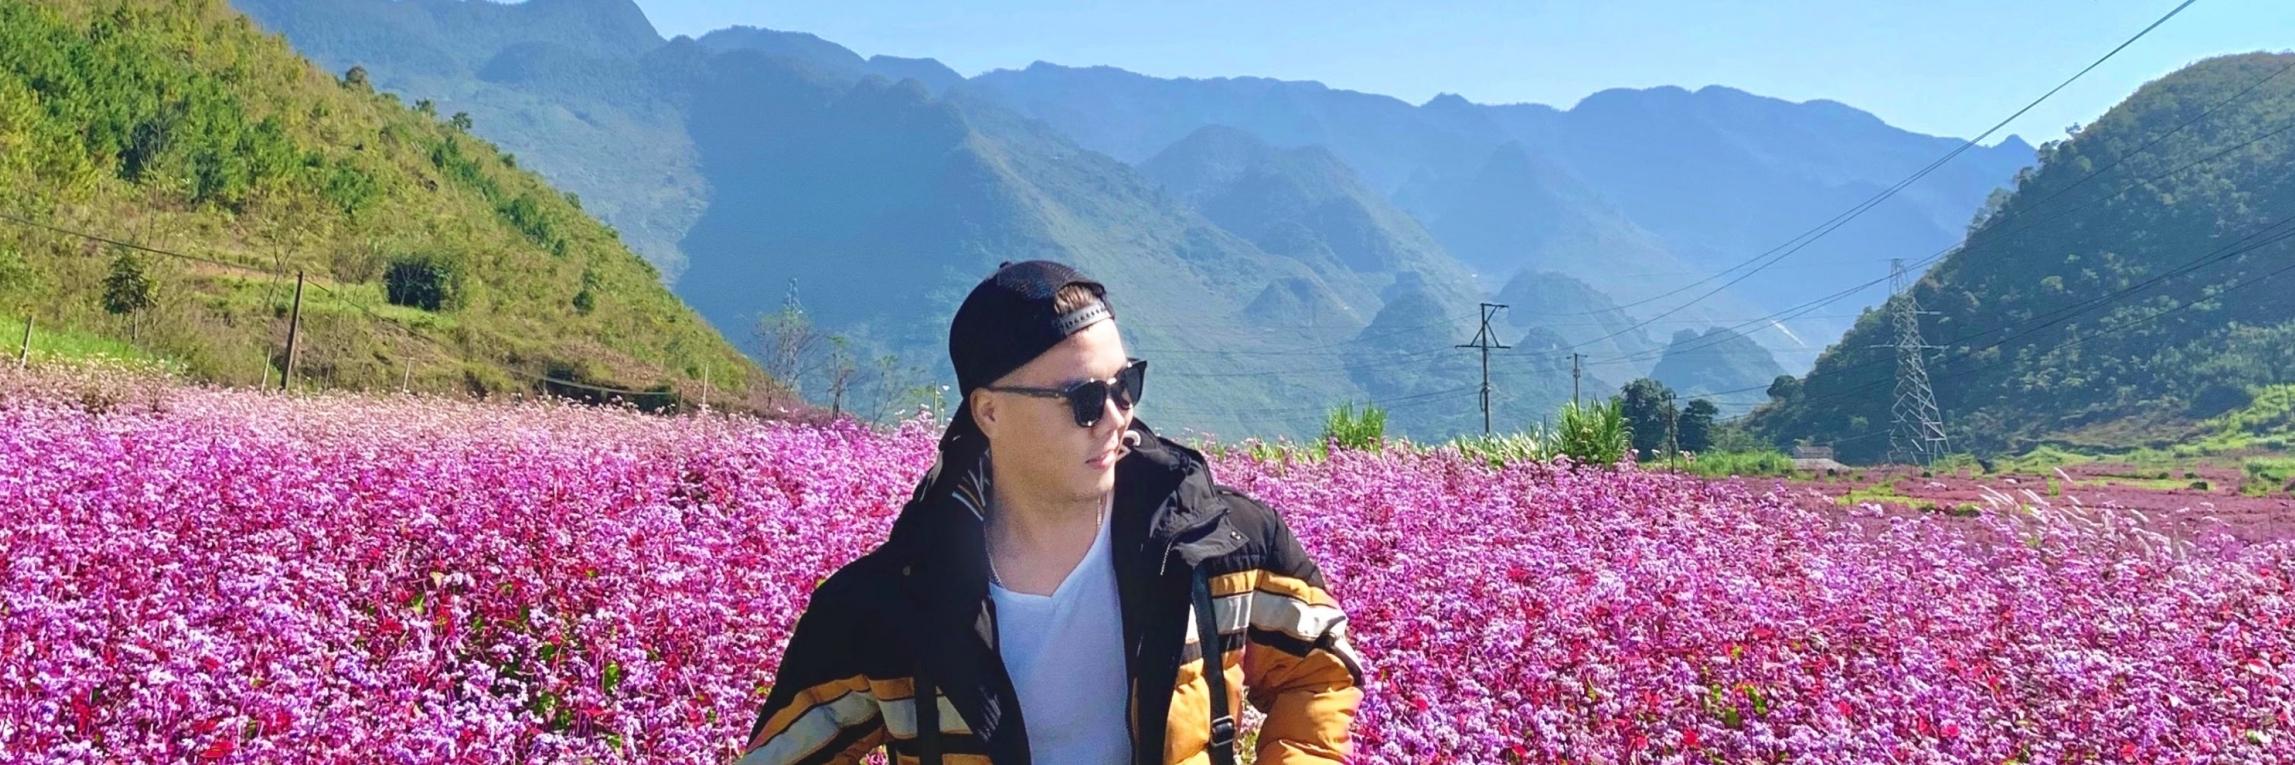 https://gody.vn/blog/nguyenhoangviet_11025323/post/di-ngay-keo-lo-mot-mua-hoa-tam-giac-mach-5966